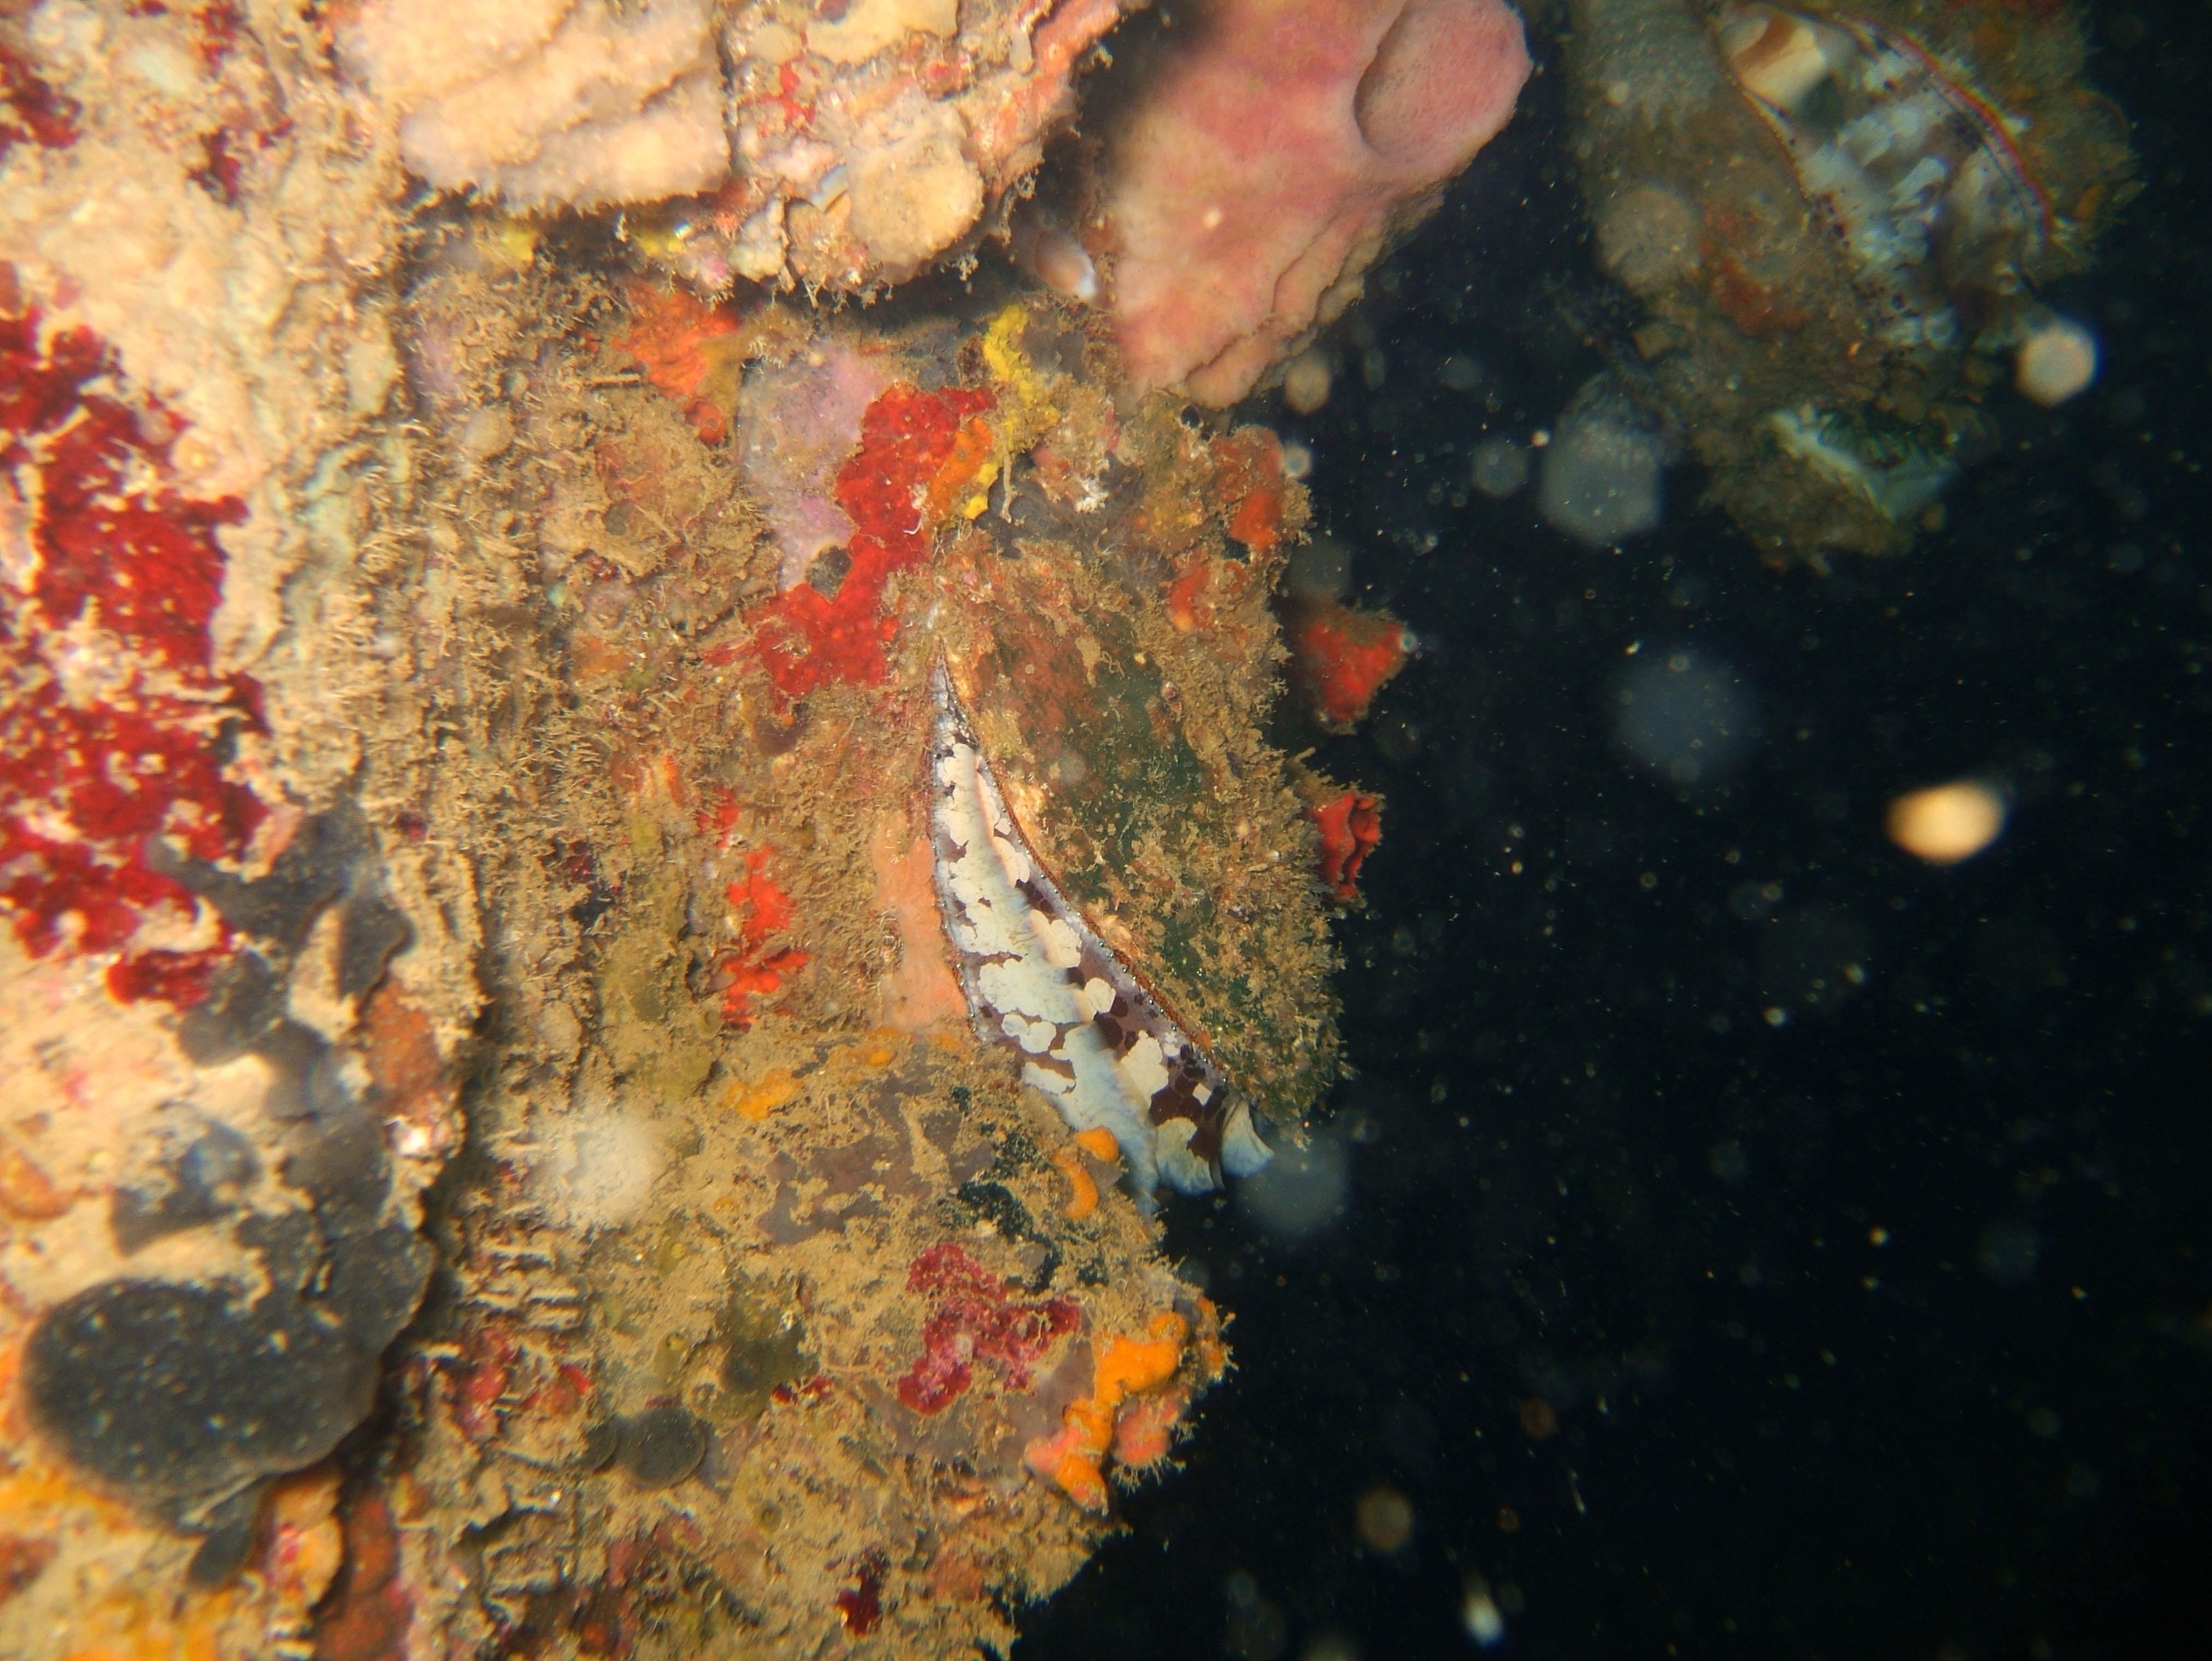 Coron dive site 8 Wreck dive IJN Olympia Maru July 2005 10